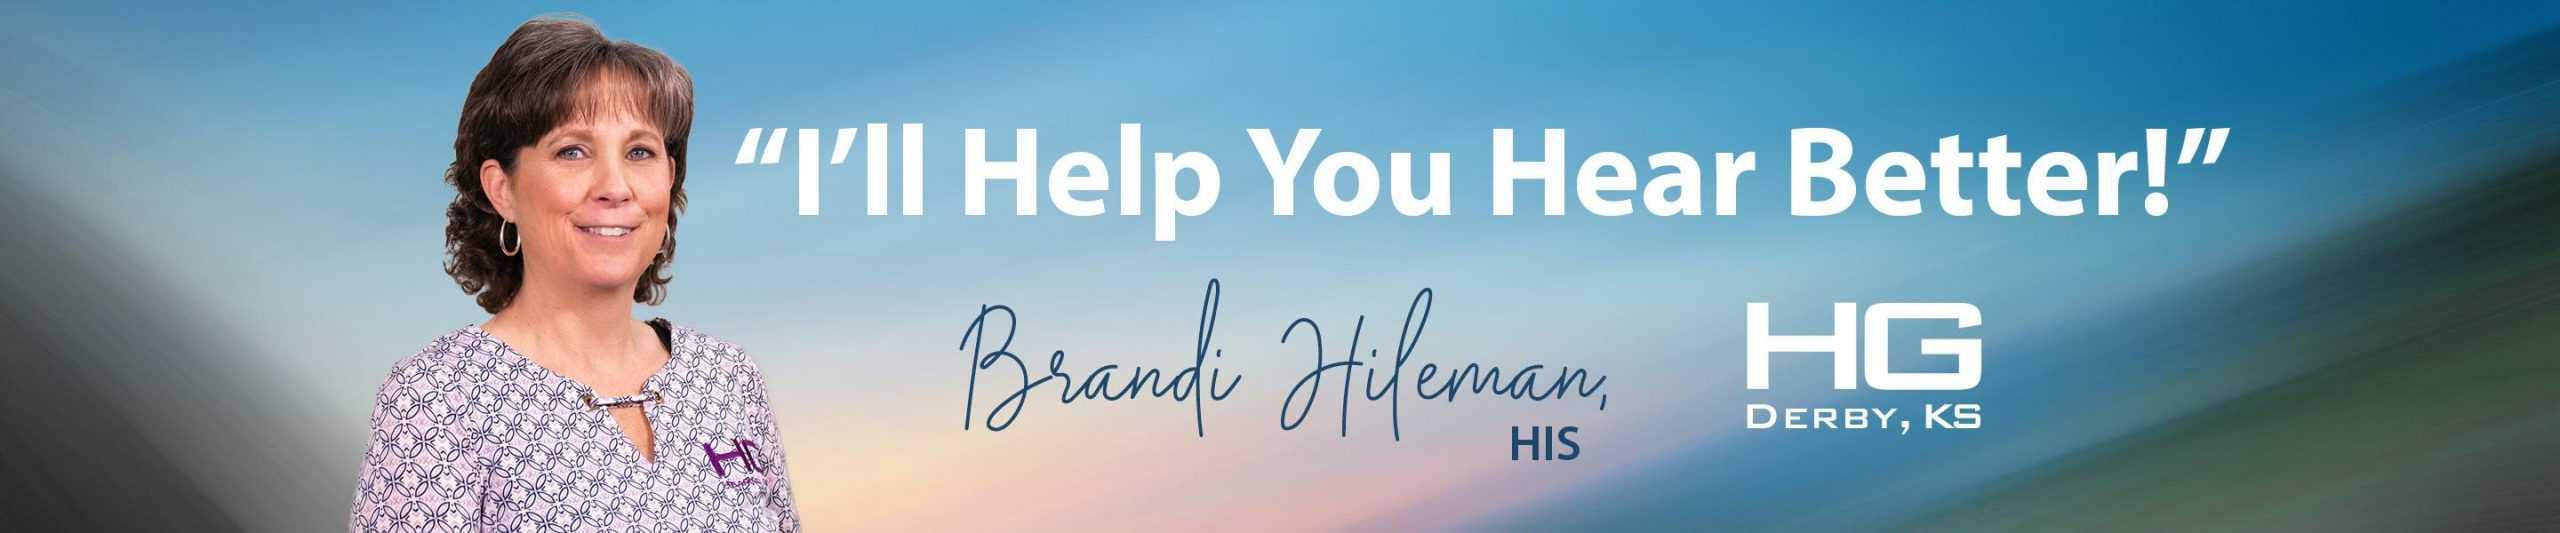 Hearing Group Derby Brandi Hileman